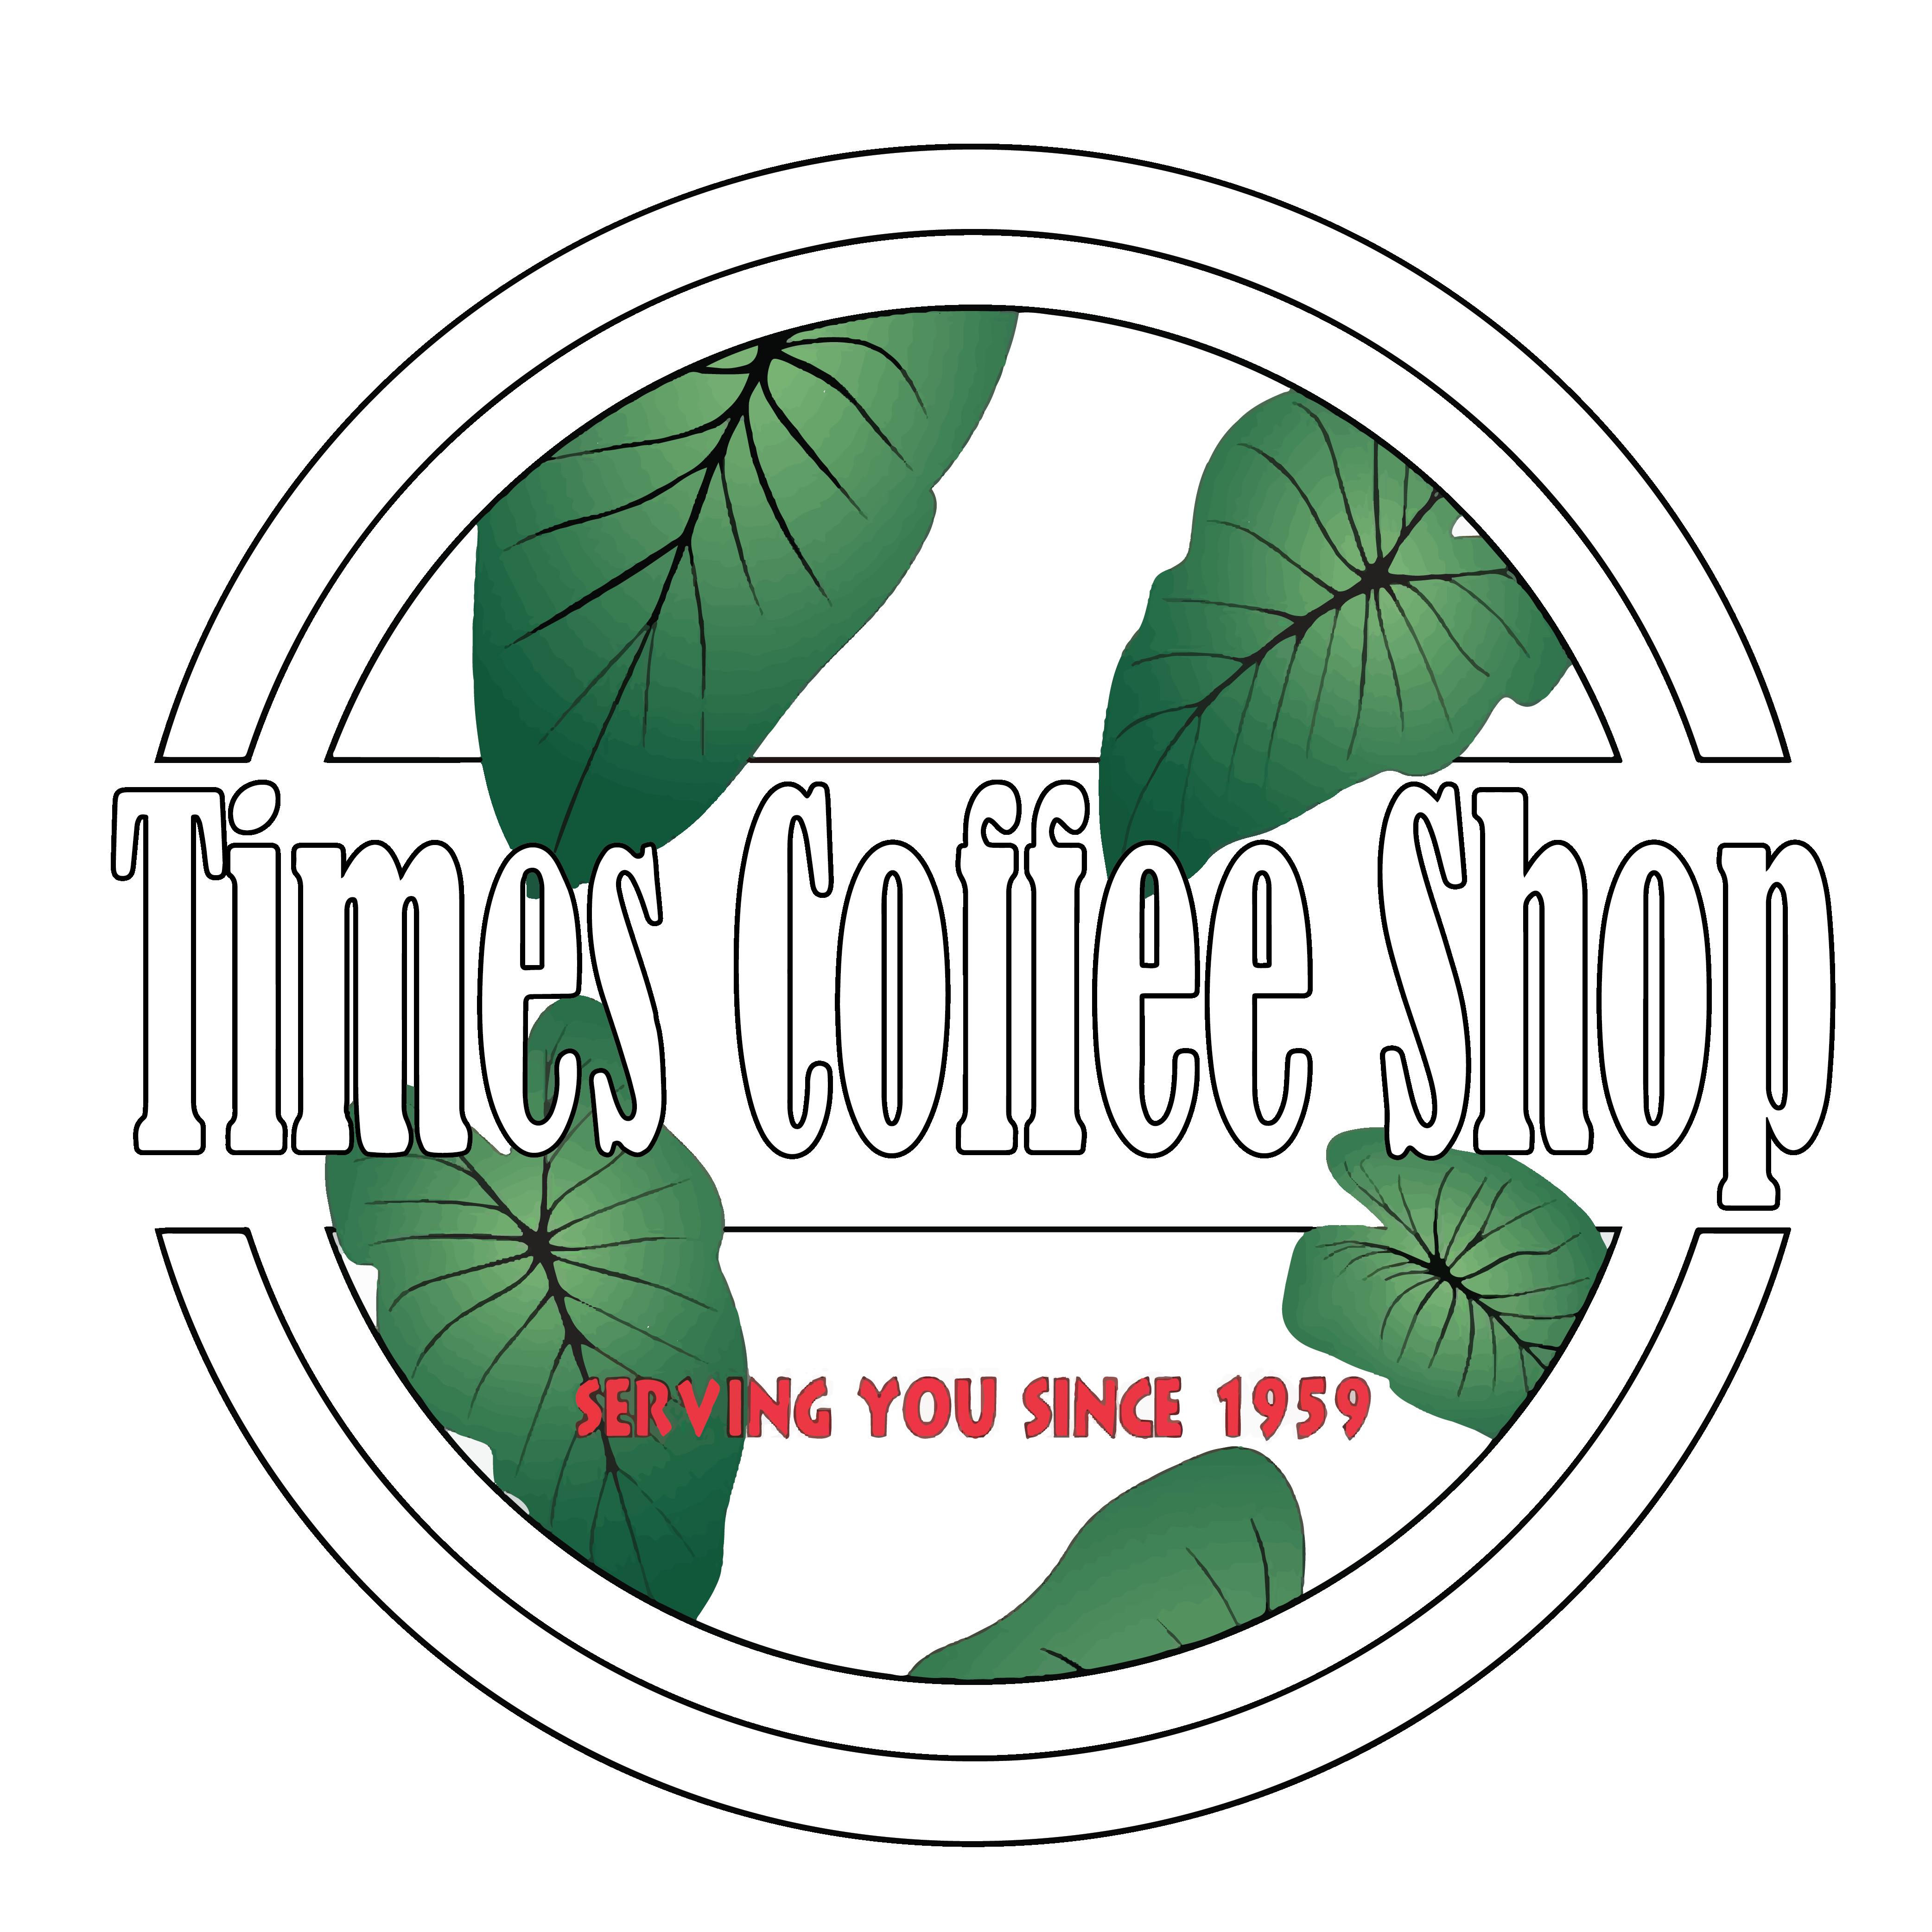 Times Coffee Shop